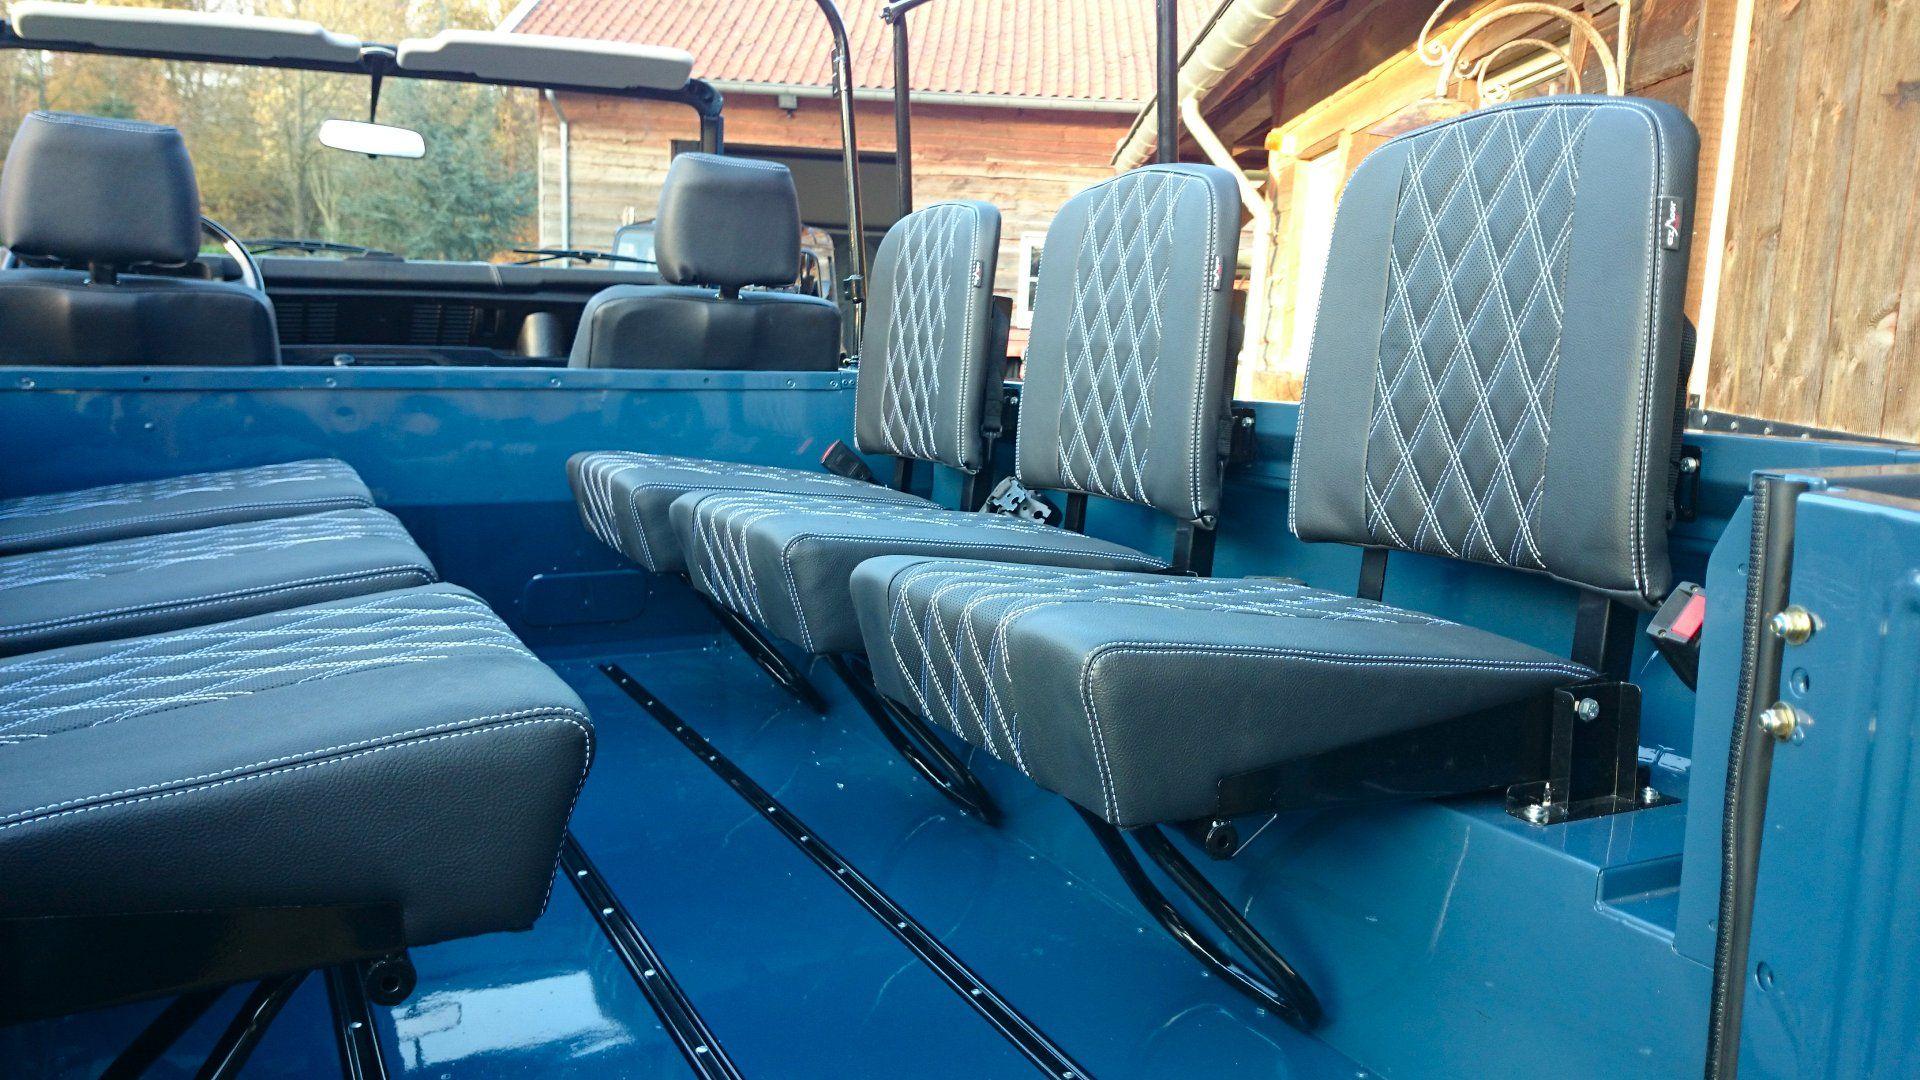 97dcc3c16 5 1988 Land Rover Defender 110 soft top LHD Arles Blue 2.5 Td day 15 ...